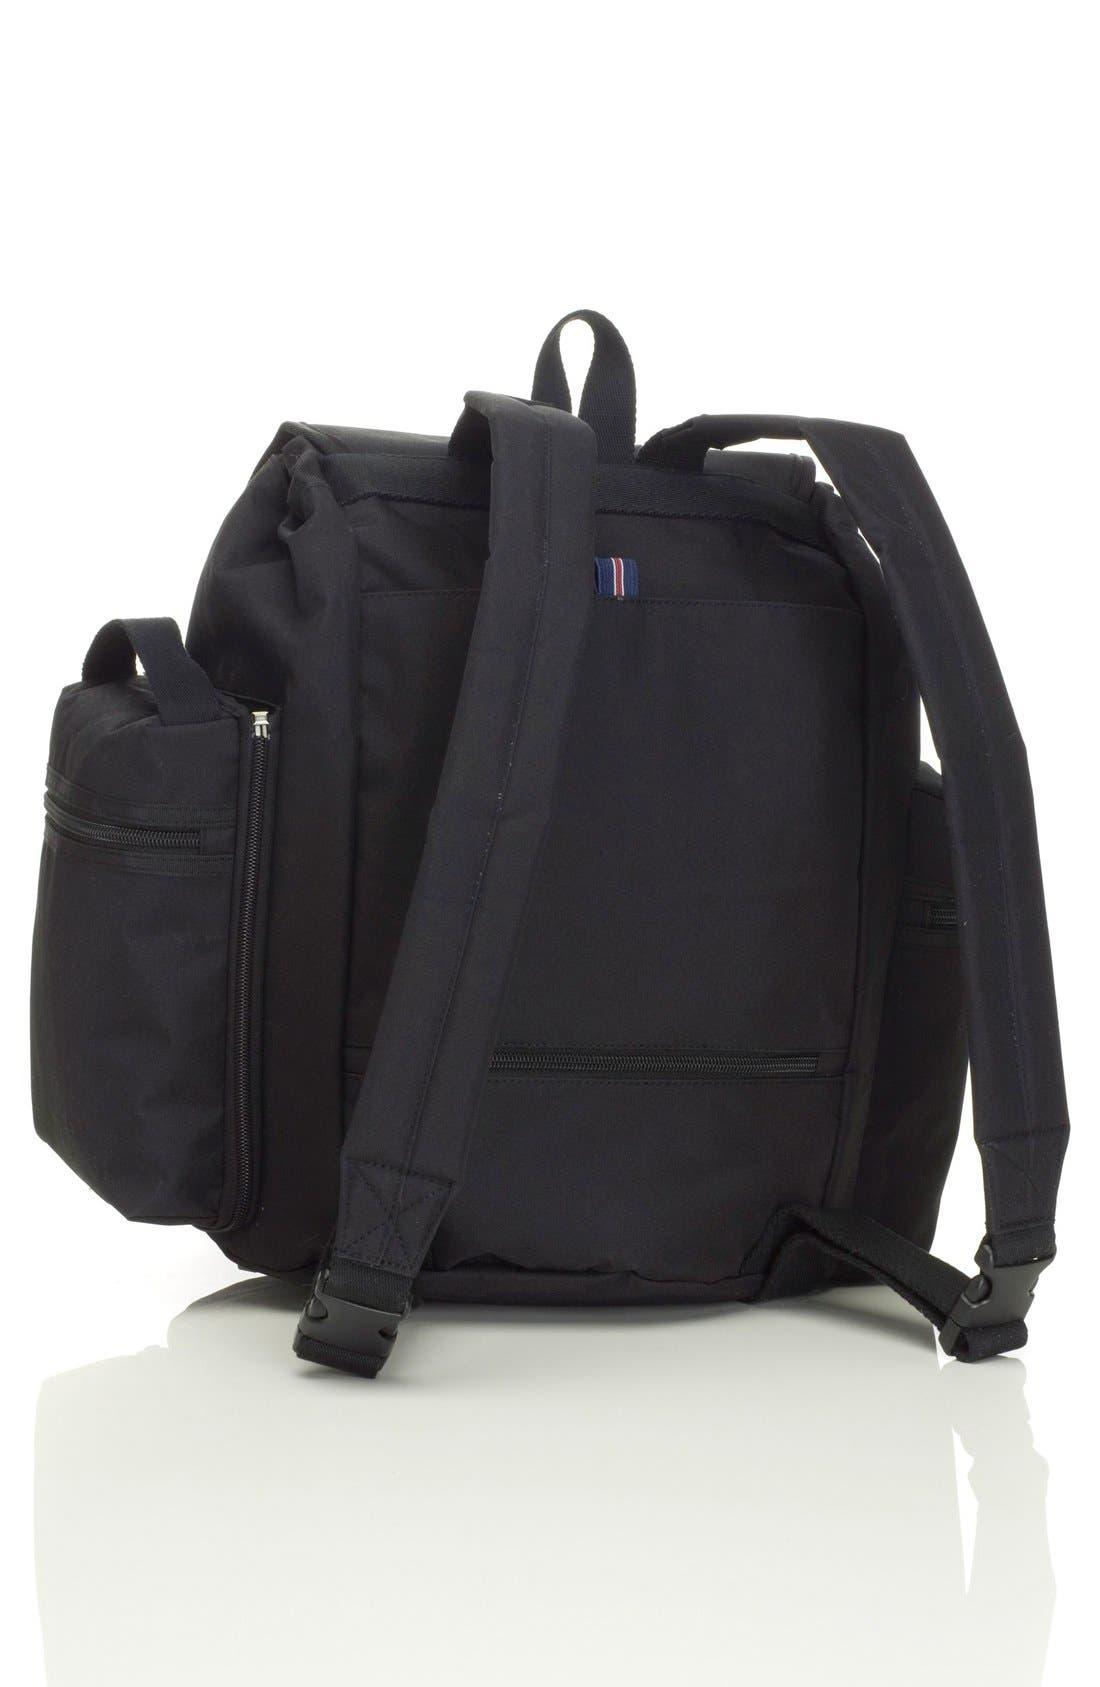 Alternate Image 2  - Storksak Travel Backpack Diaper Bag